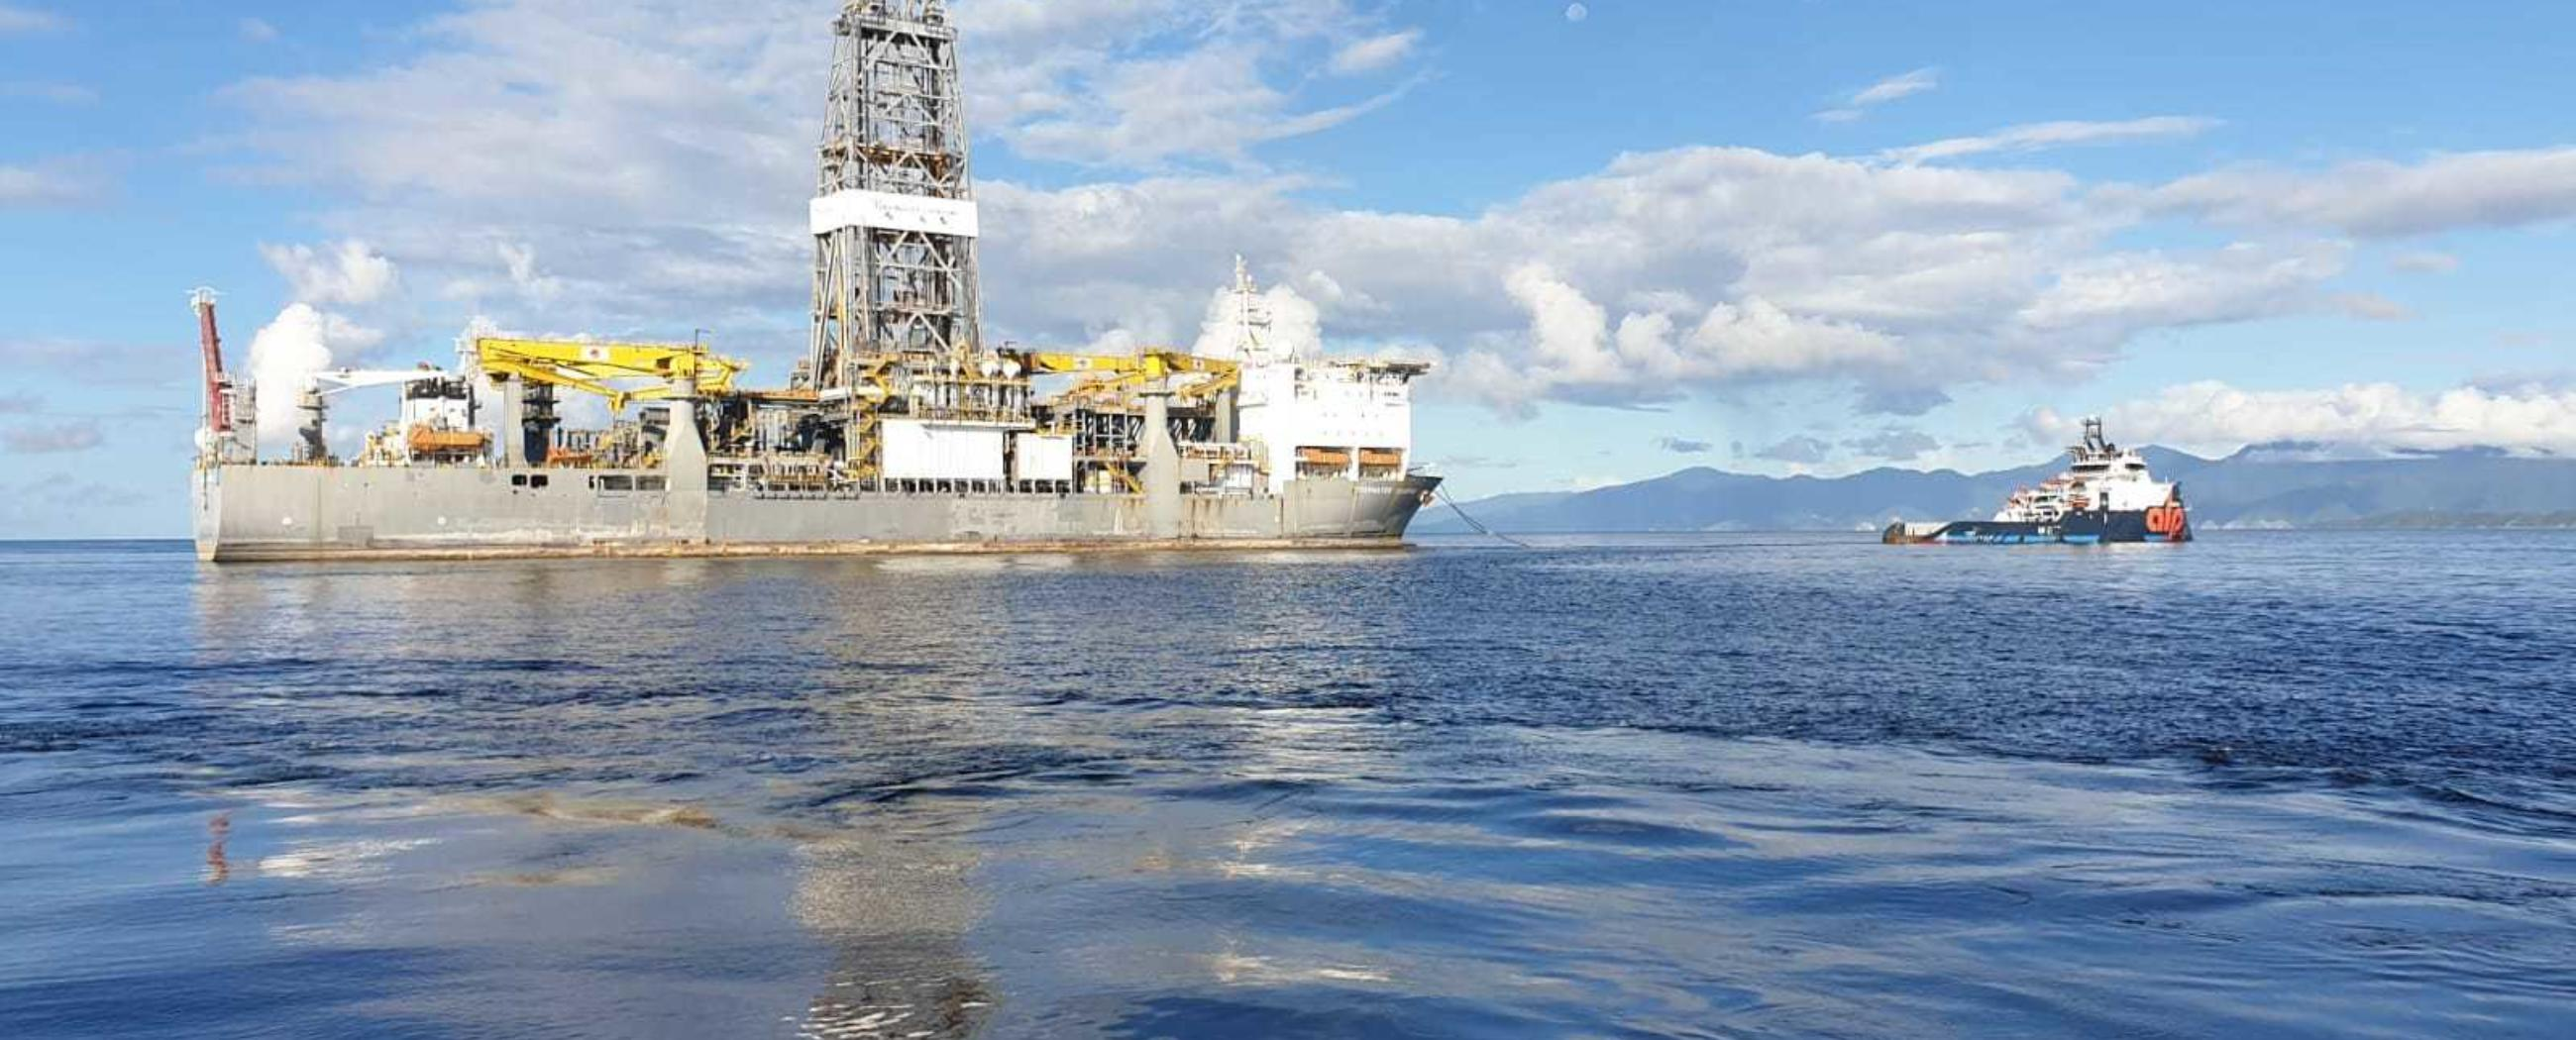 ALP-Striker_Deepwater-Champion_drillship_towage_NOV2019.jpg